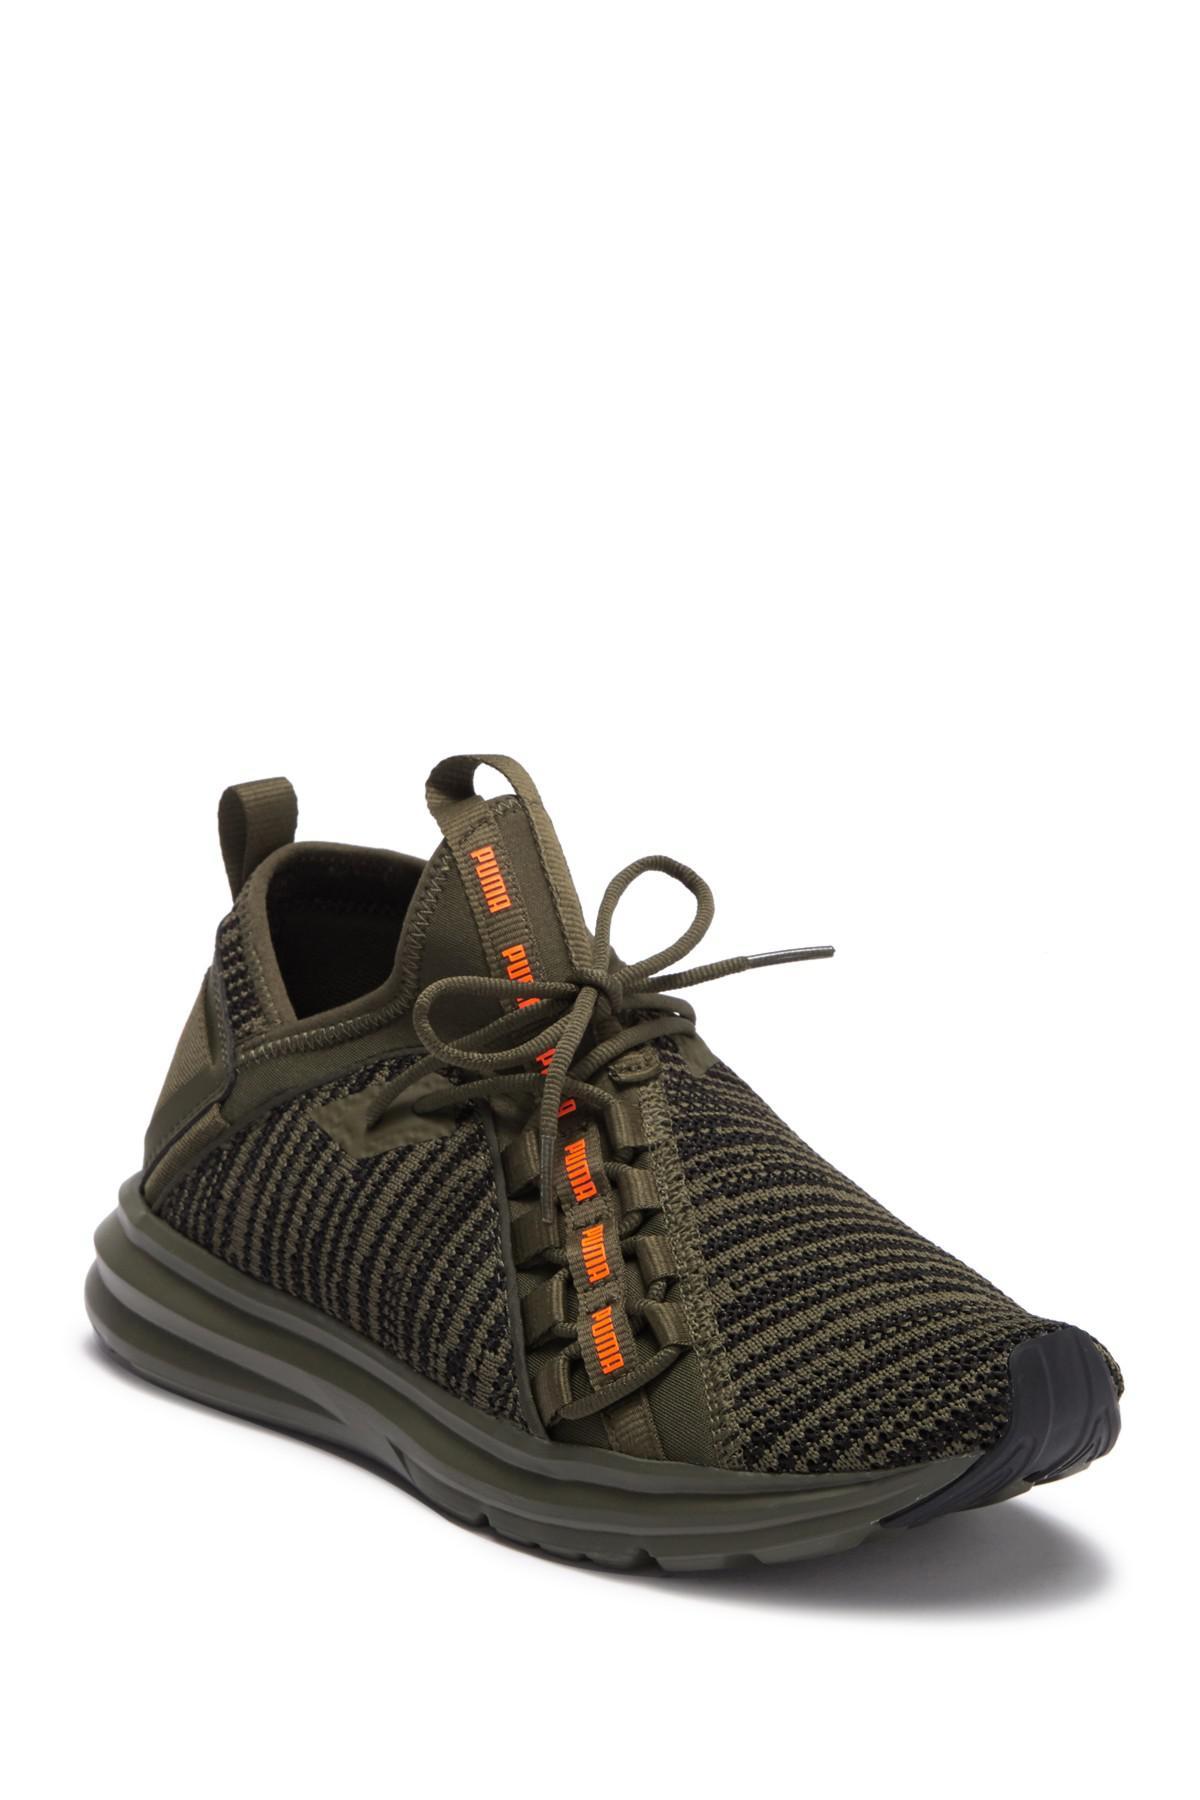 PUMA Enzo Peak Sneaker in Olive Green